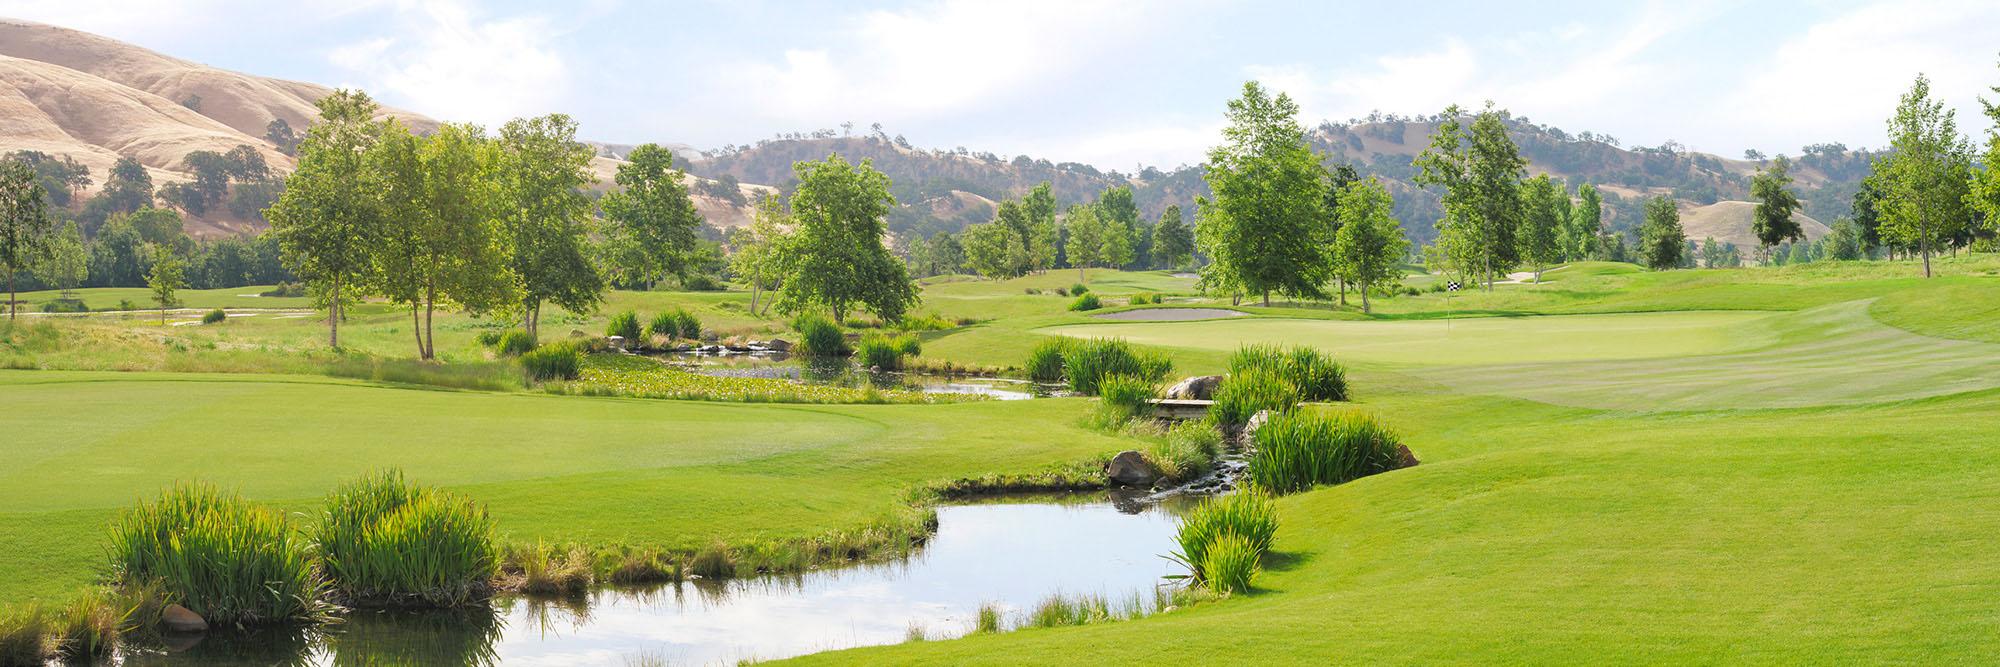 Golf Course Image - Yocha Dehe No. 16